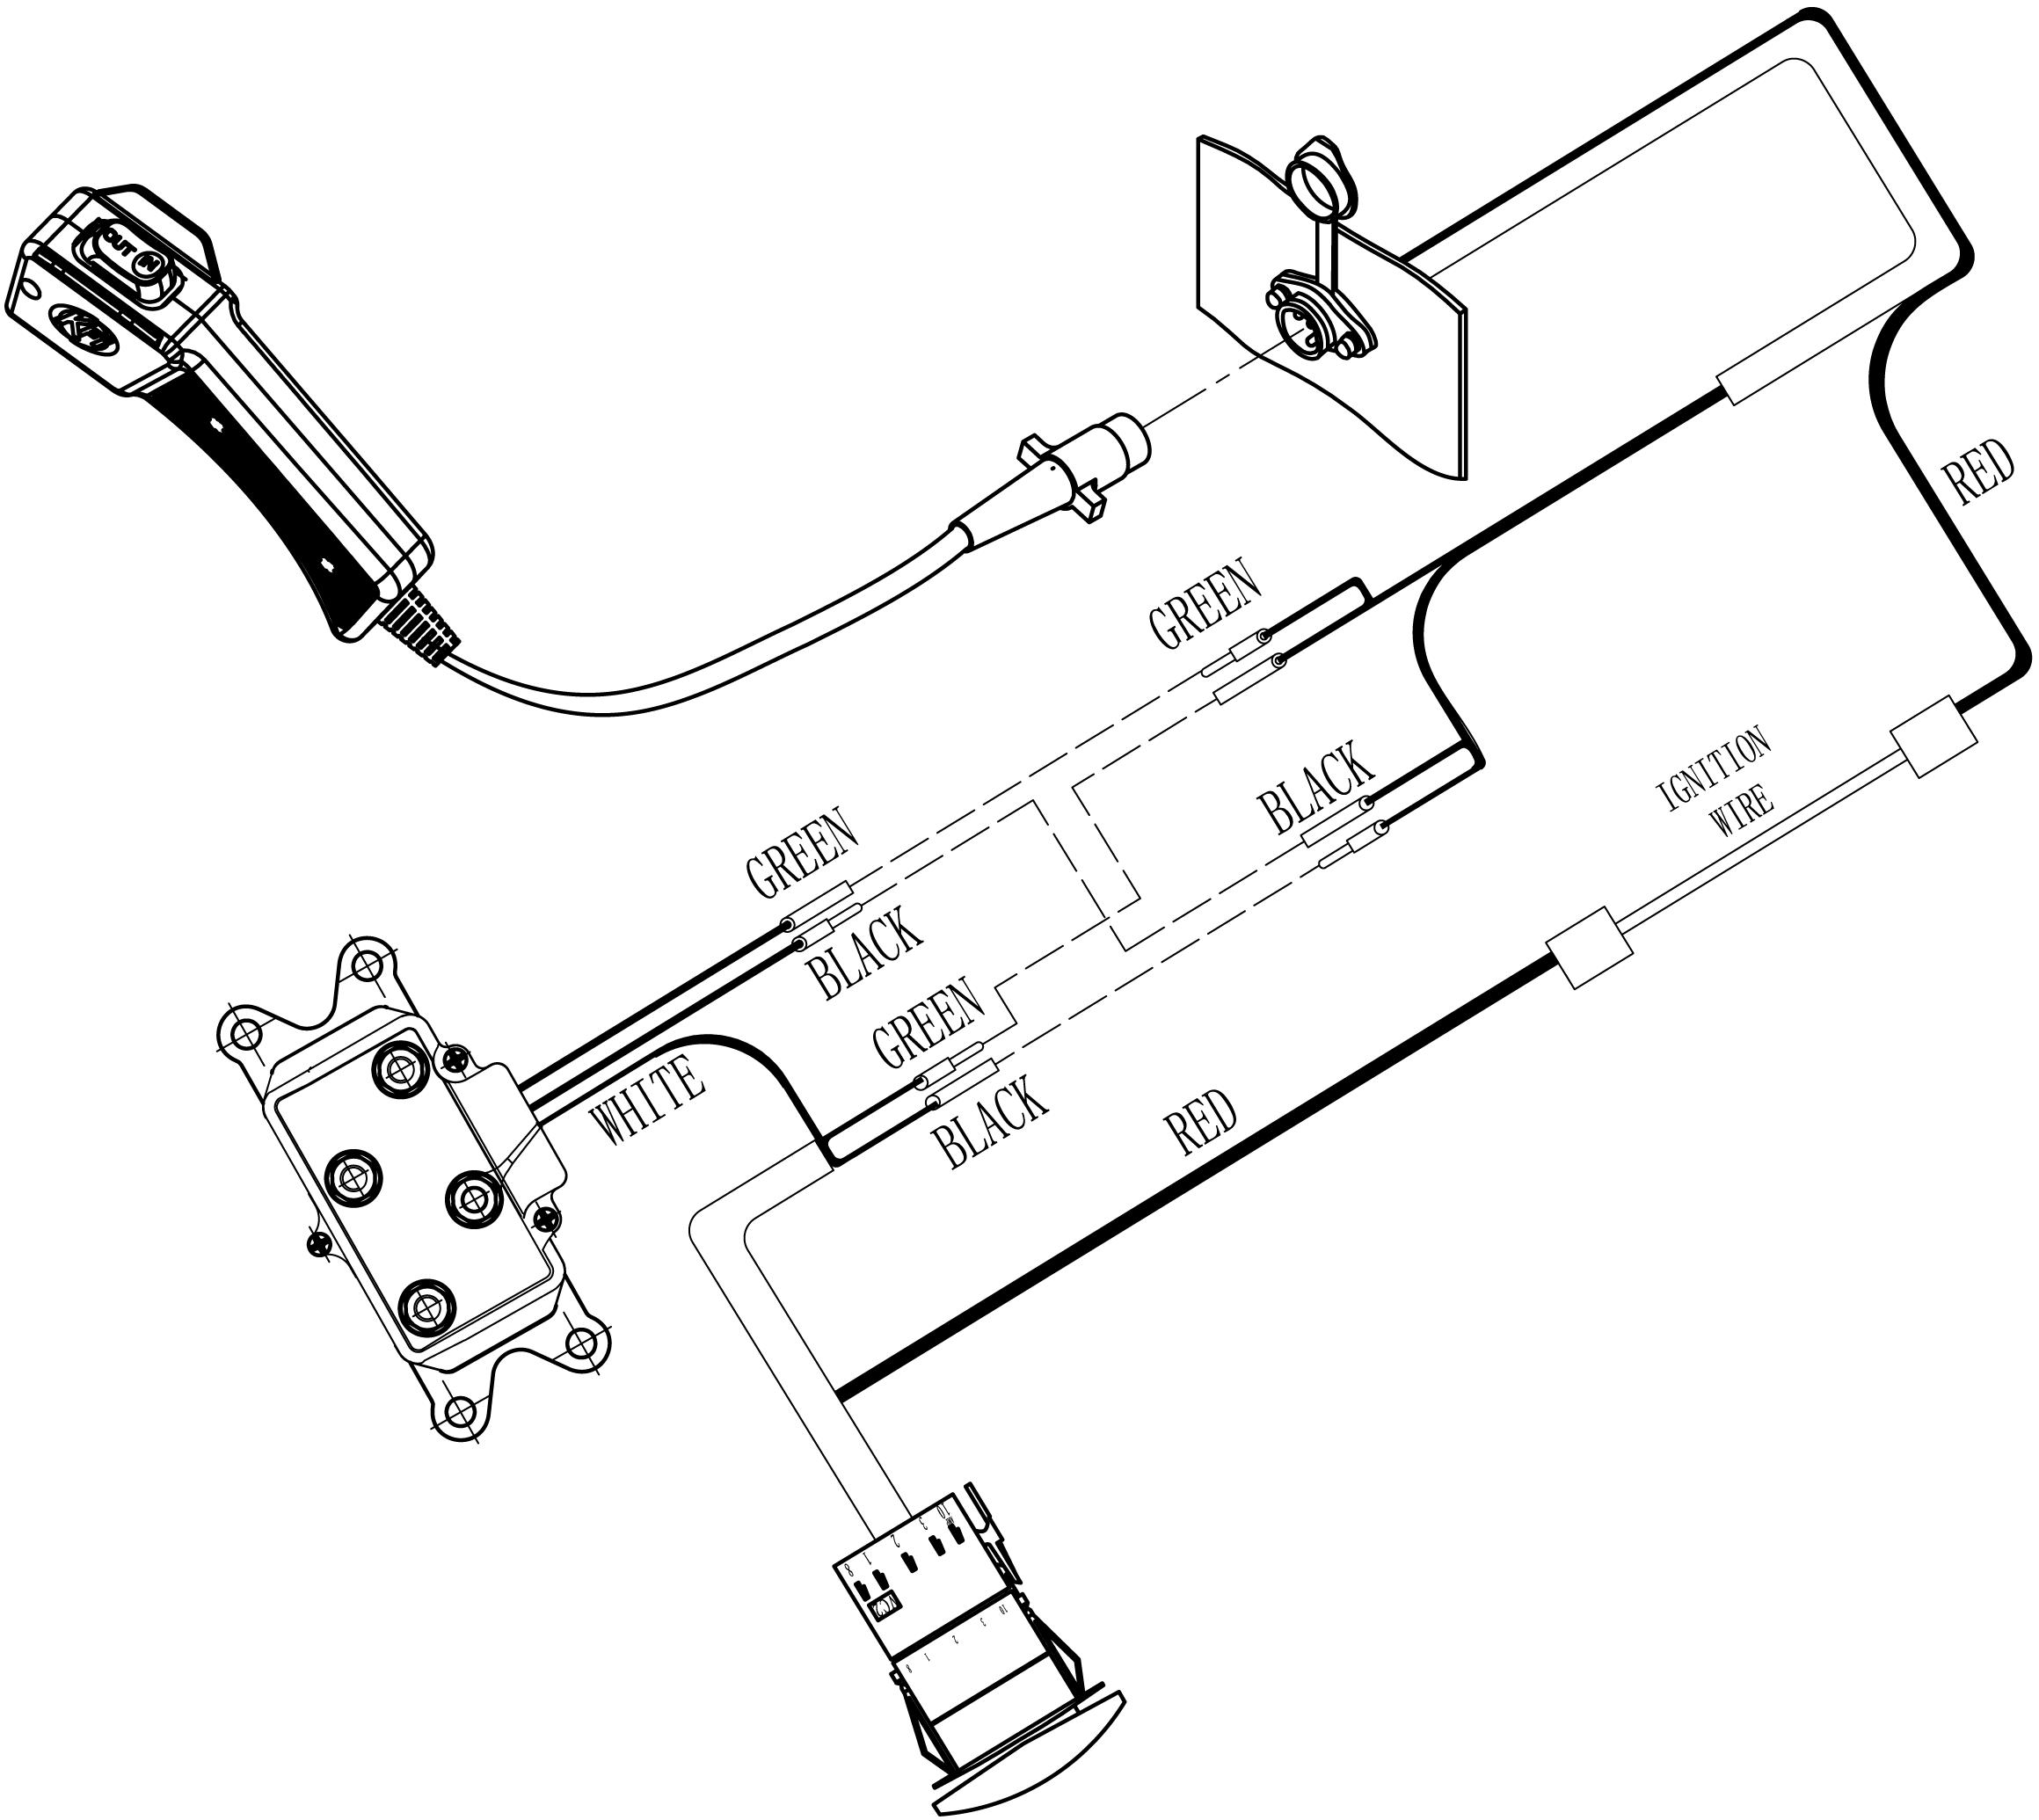 superwinch wiring diagram for atv utv winch wiring diagram bomerang bali tintenglueck de  utv winch wiring diagram bomerang